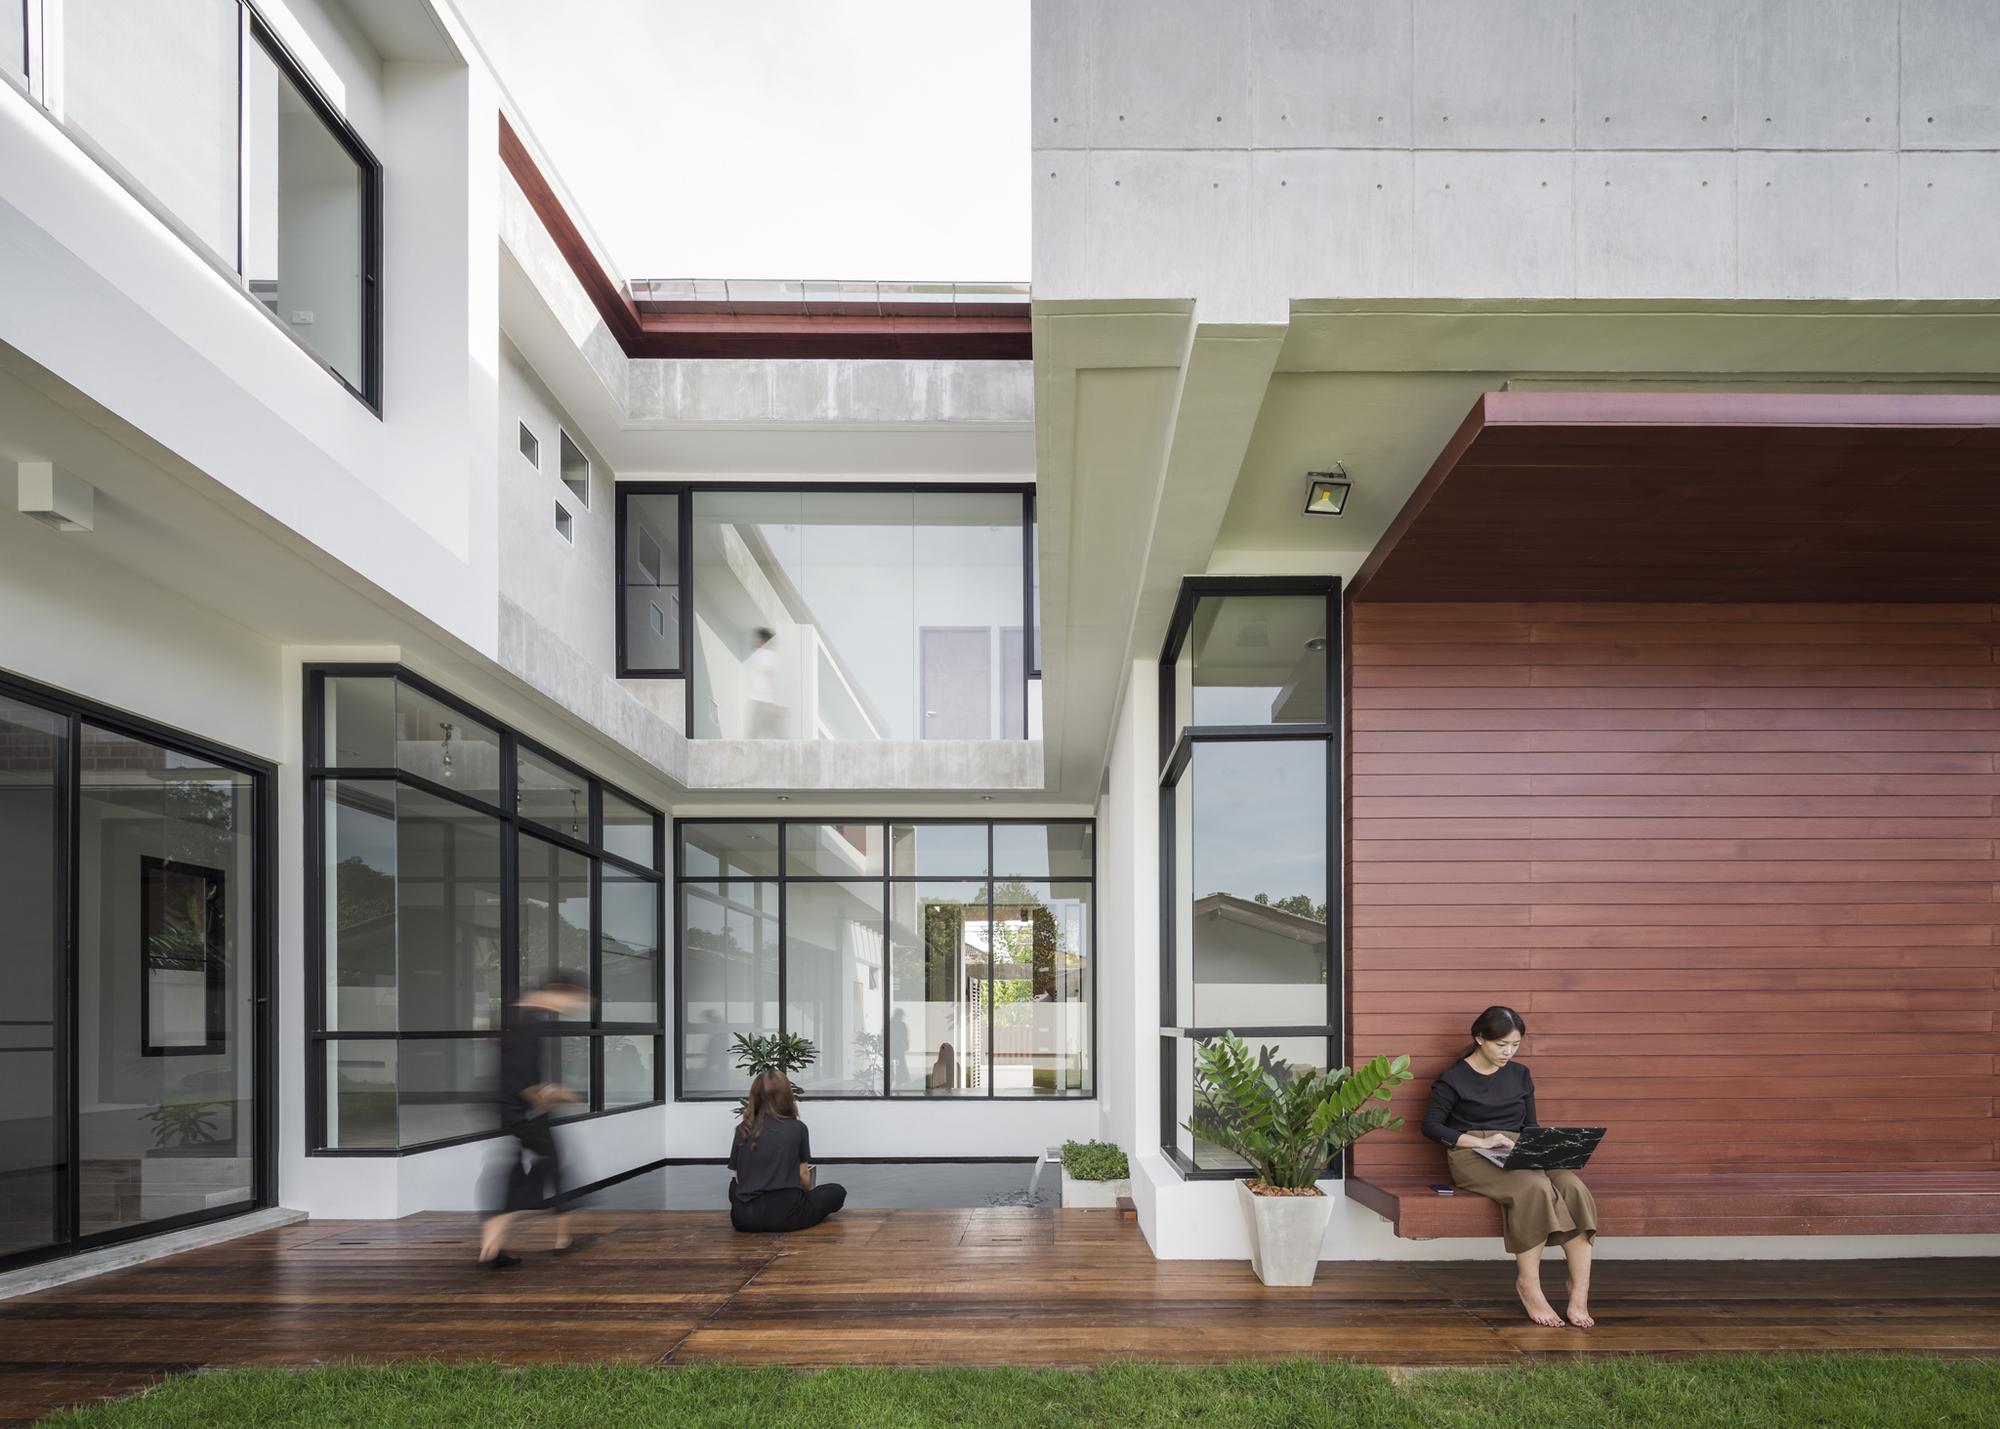 Resid ncia nj touch architect archdaily brasil - Sublimissime residencia nj pupogaspar arquitetura ...